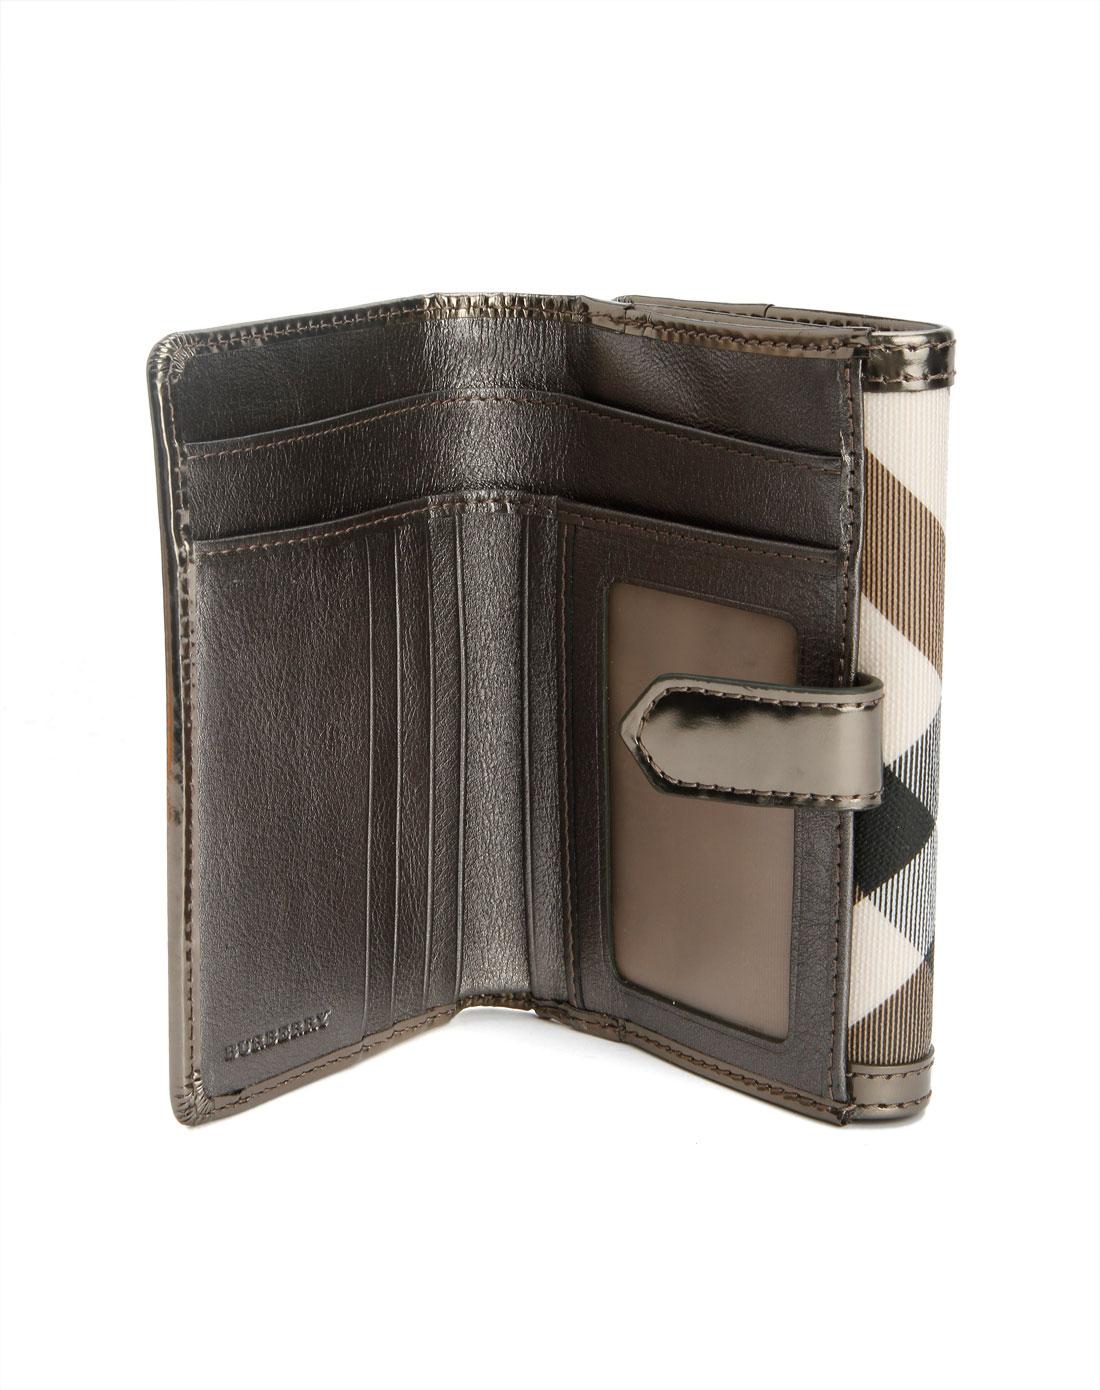 burberry配件专场女款银灰色格子时尚钱包04a510a10